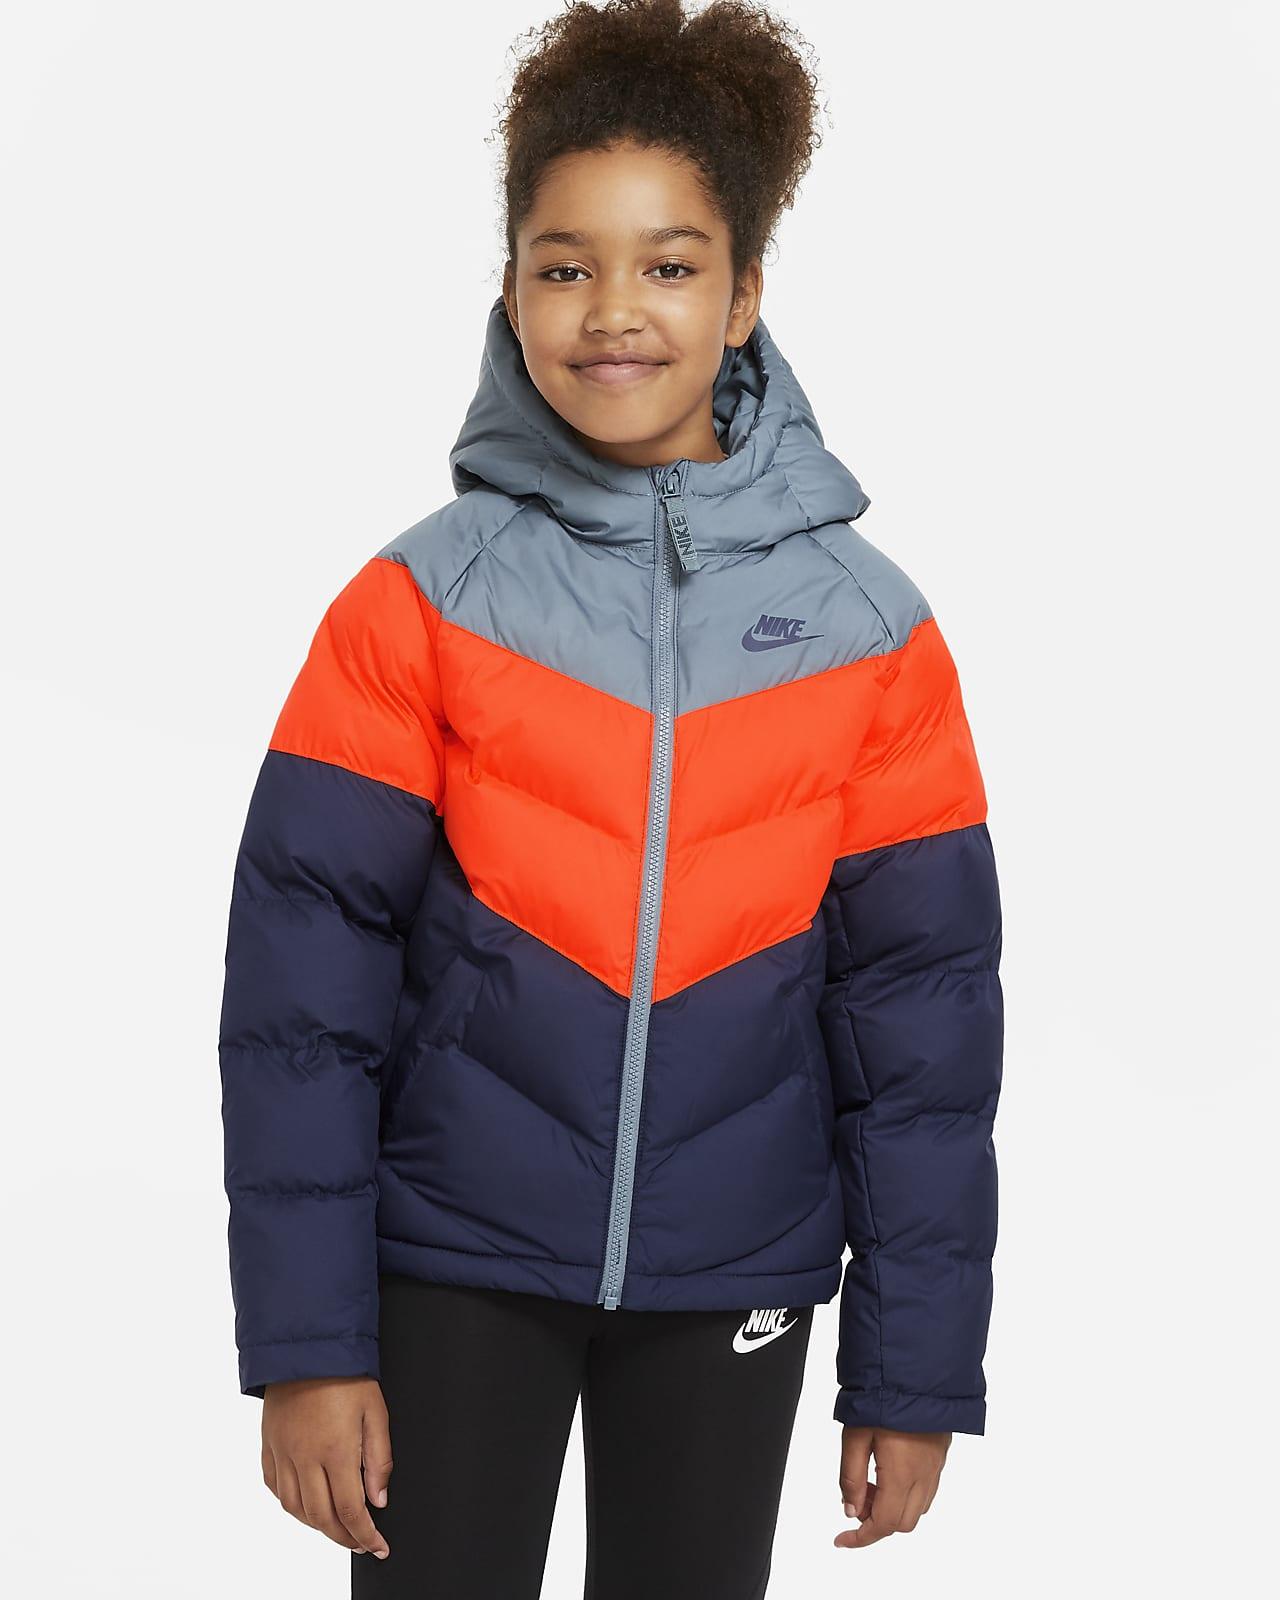 Nike Sportswear Jacke mit Synthetikfüllung für ältere Kinder